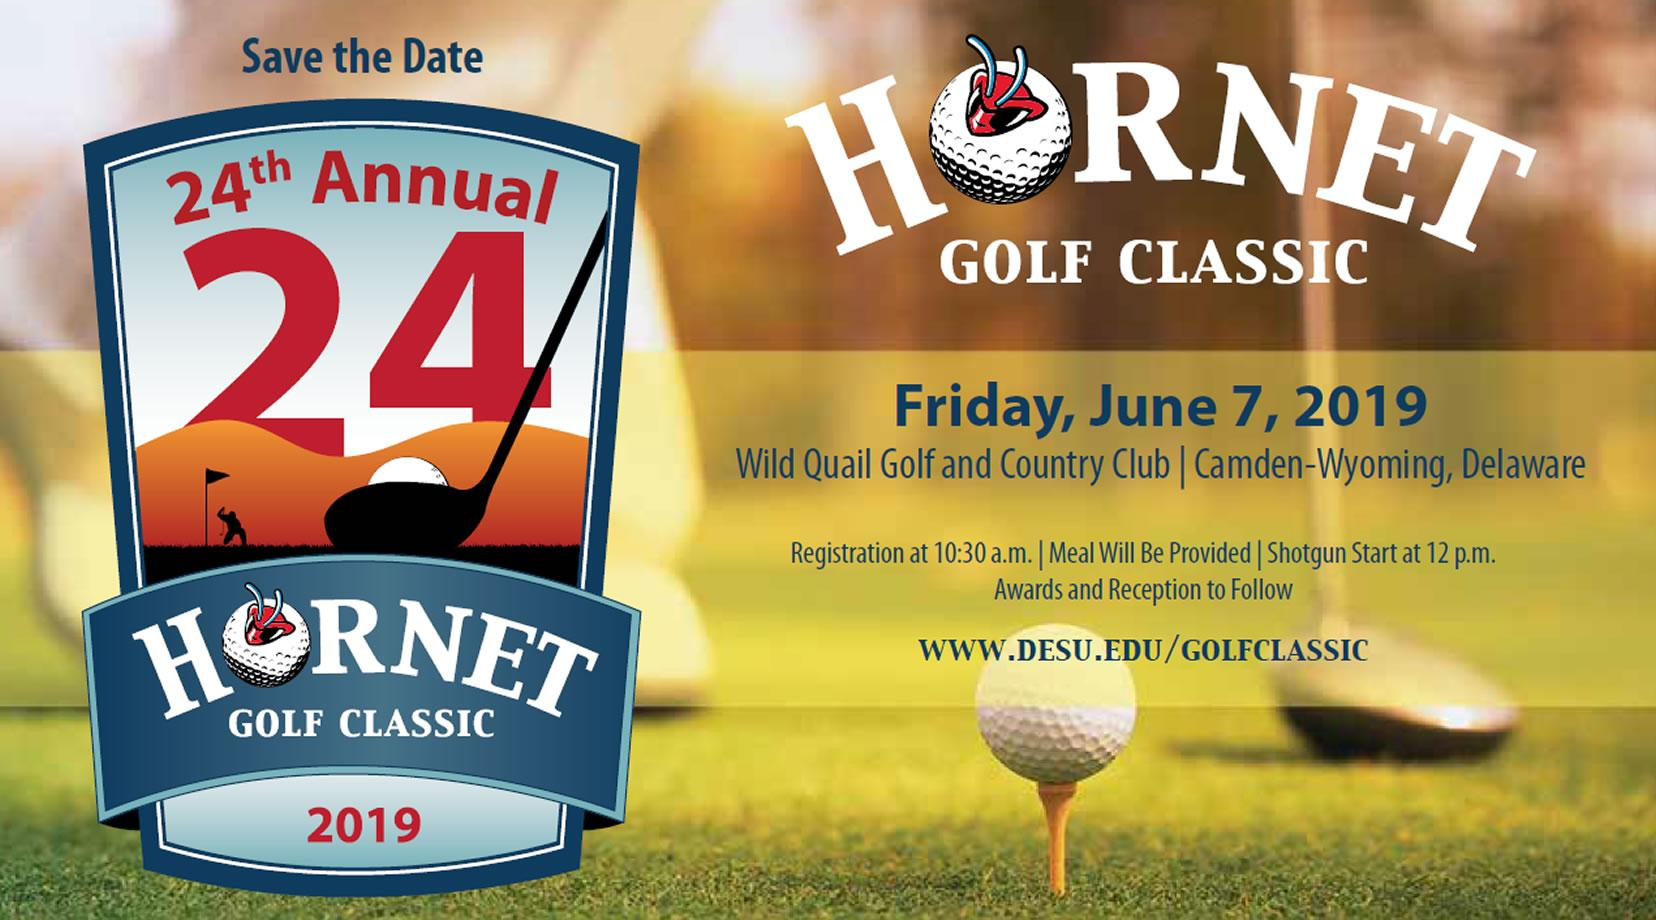 Hornet Golf Classic 2019